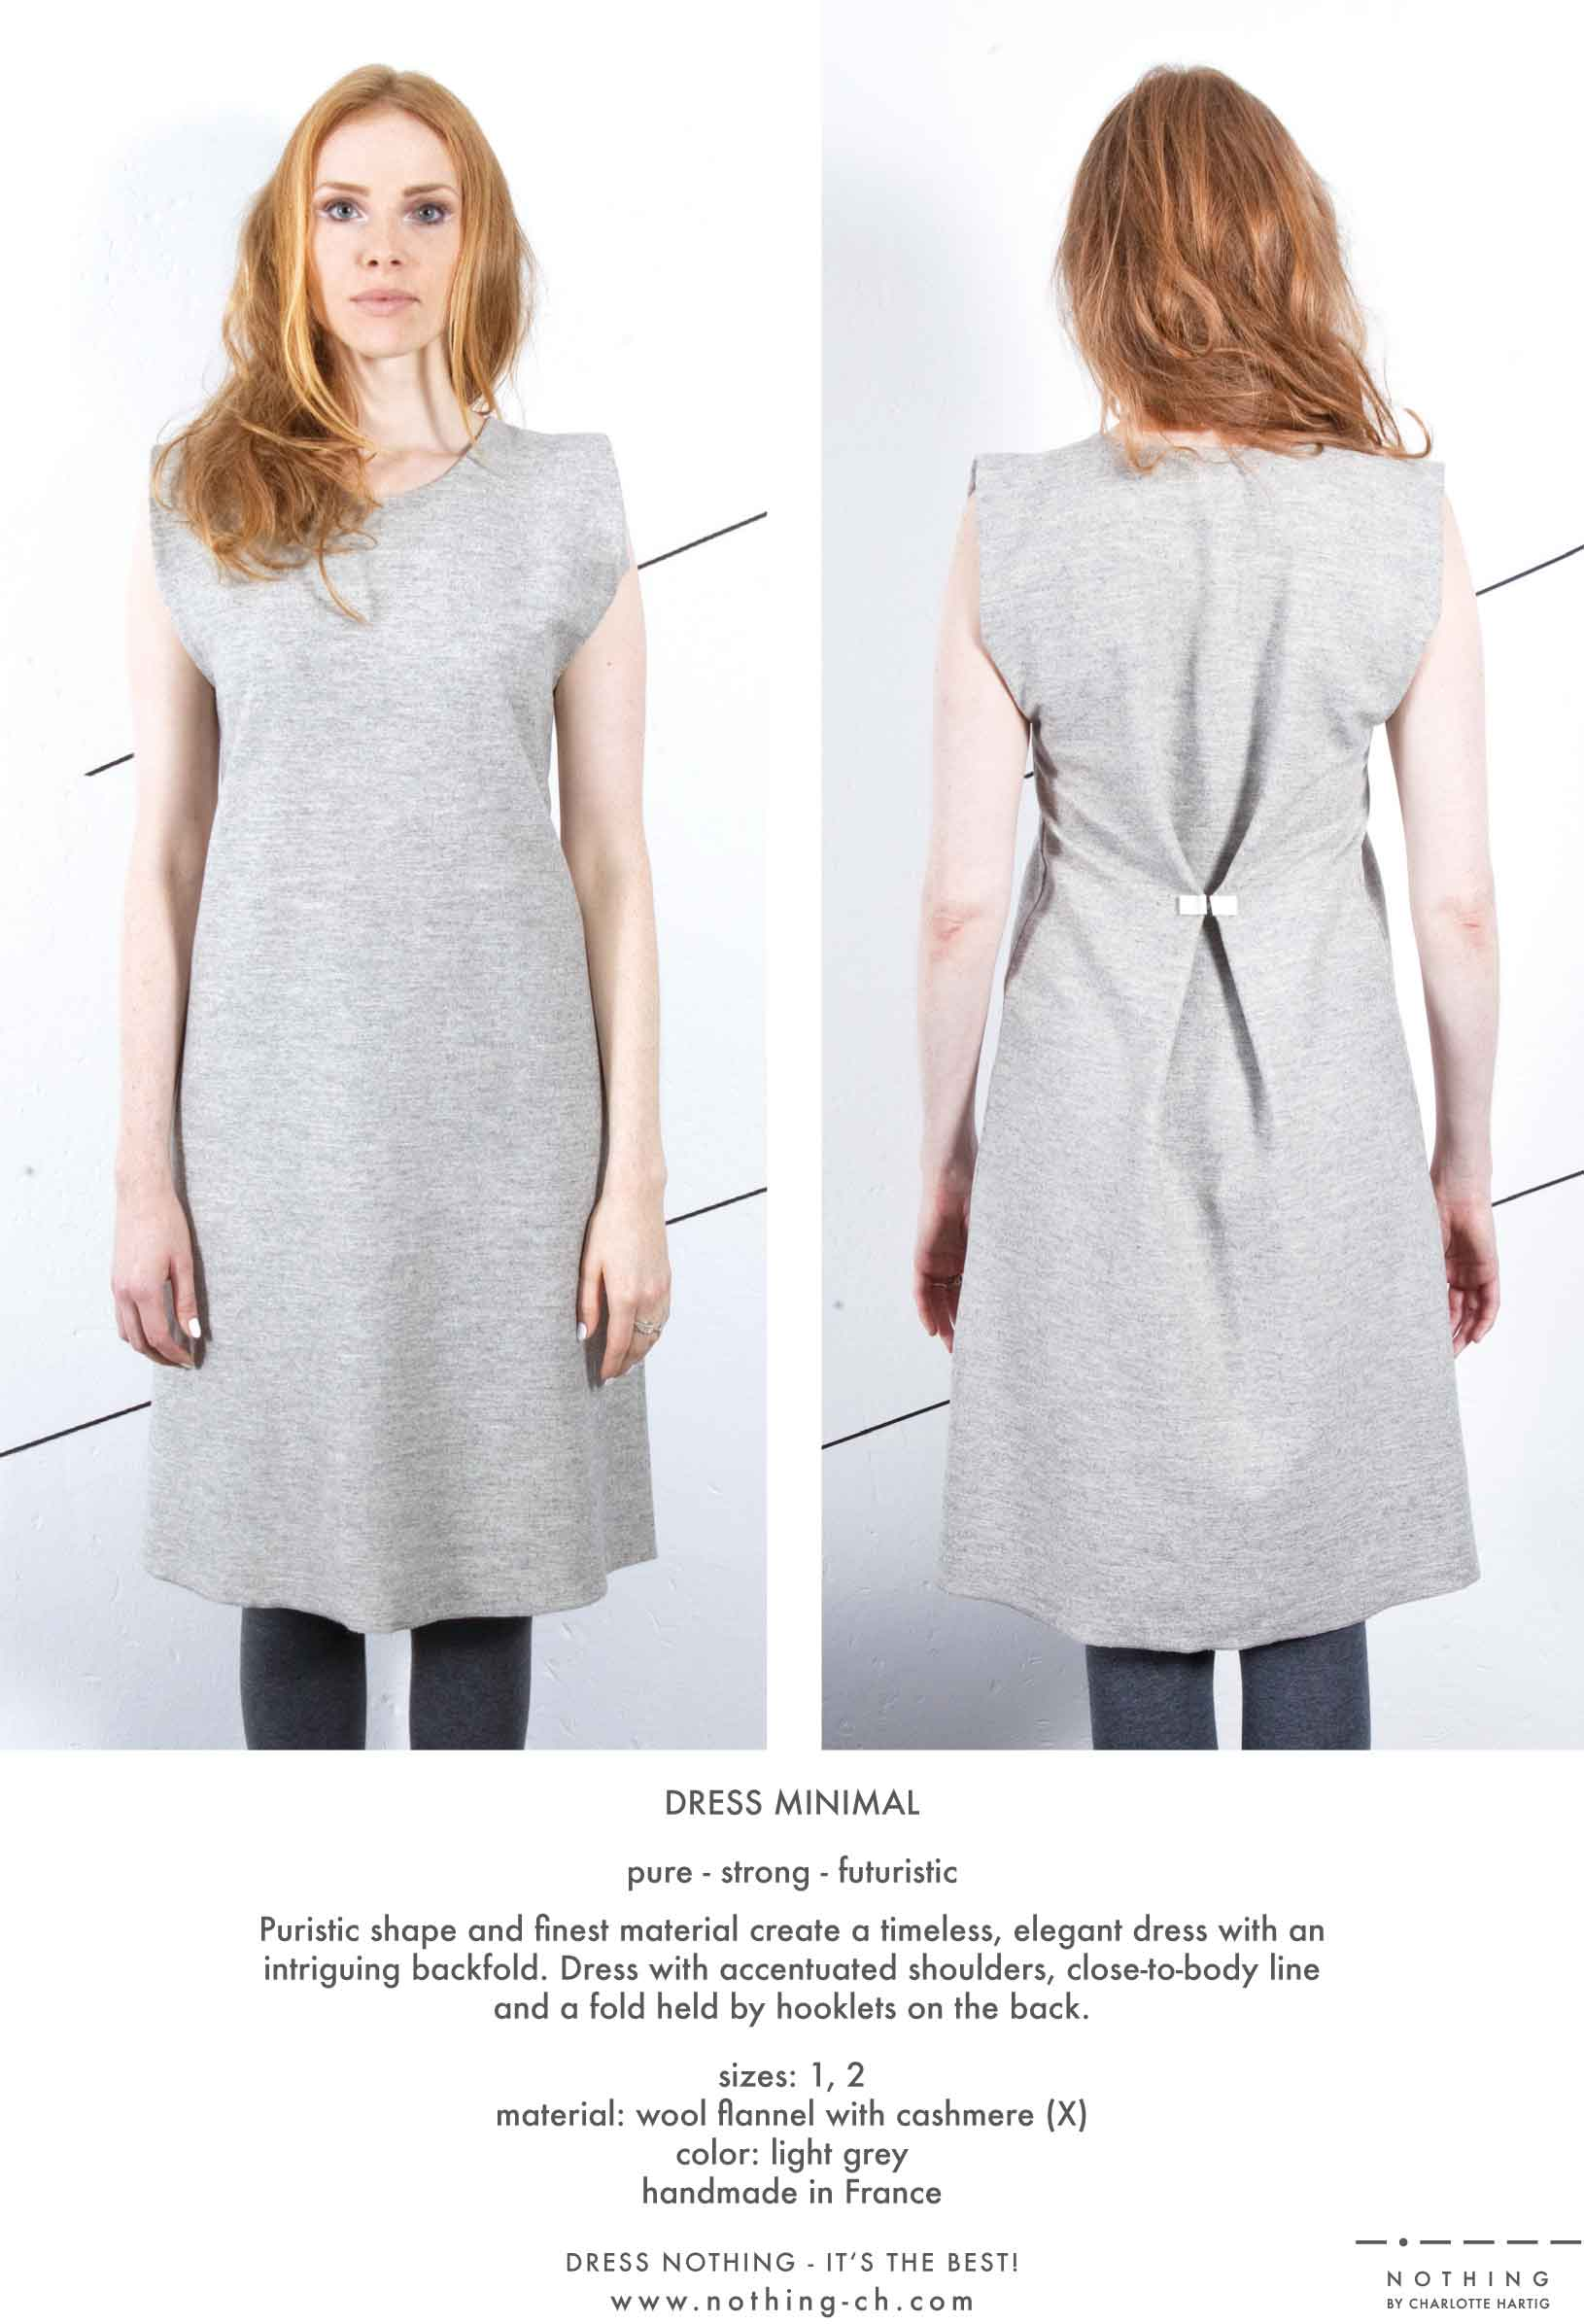 7_dress_mimimal_back-2_web.jpg